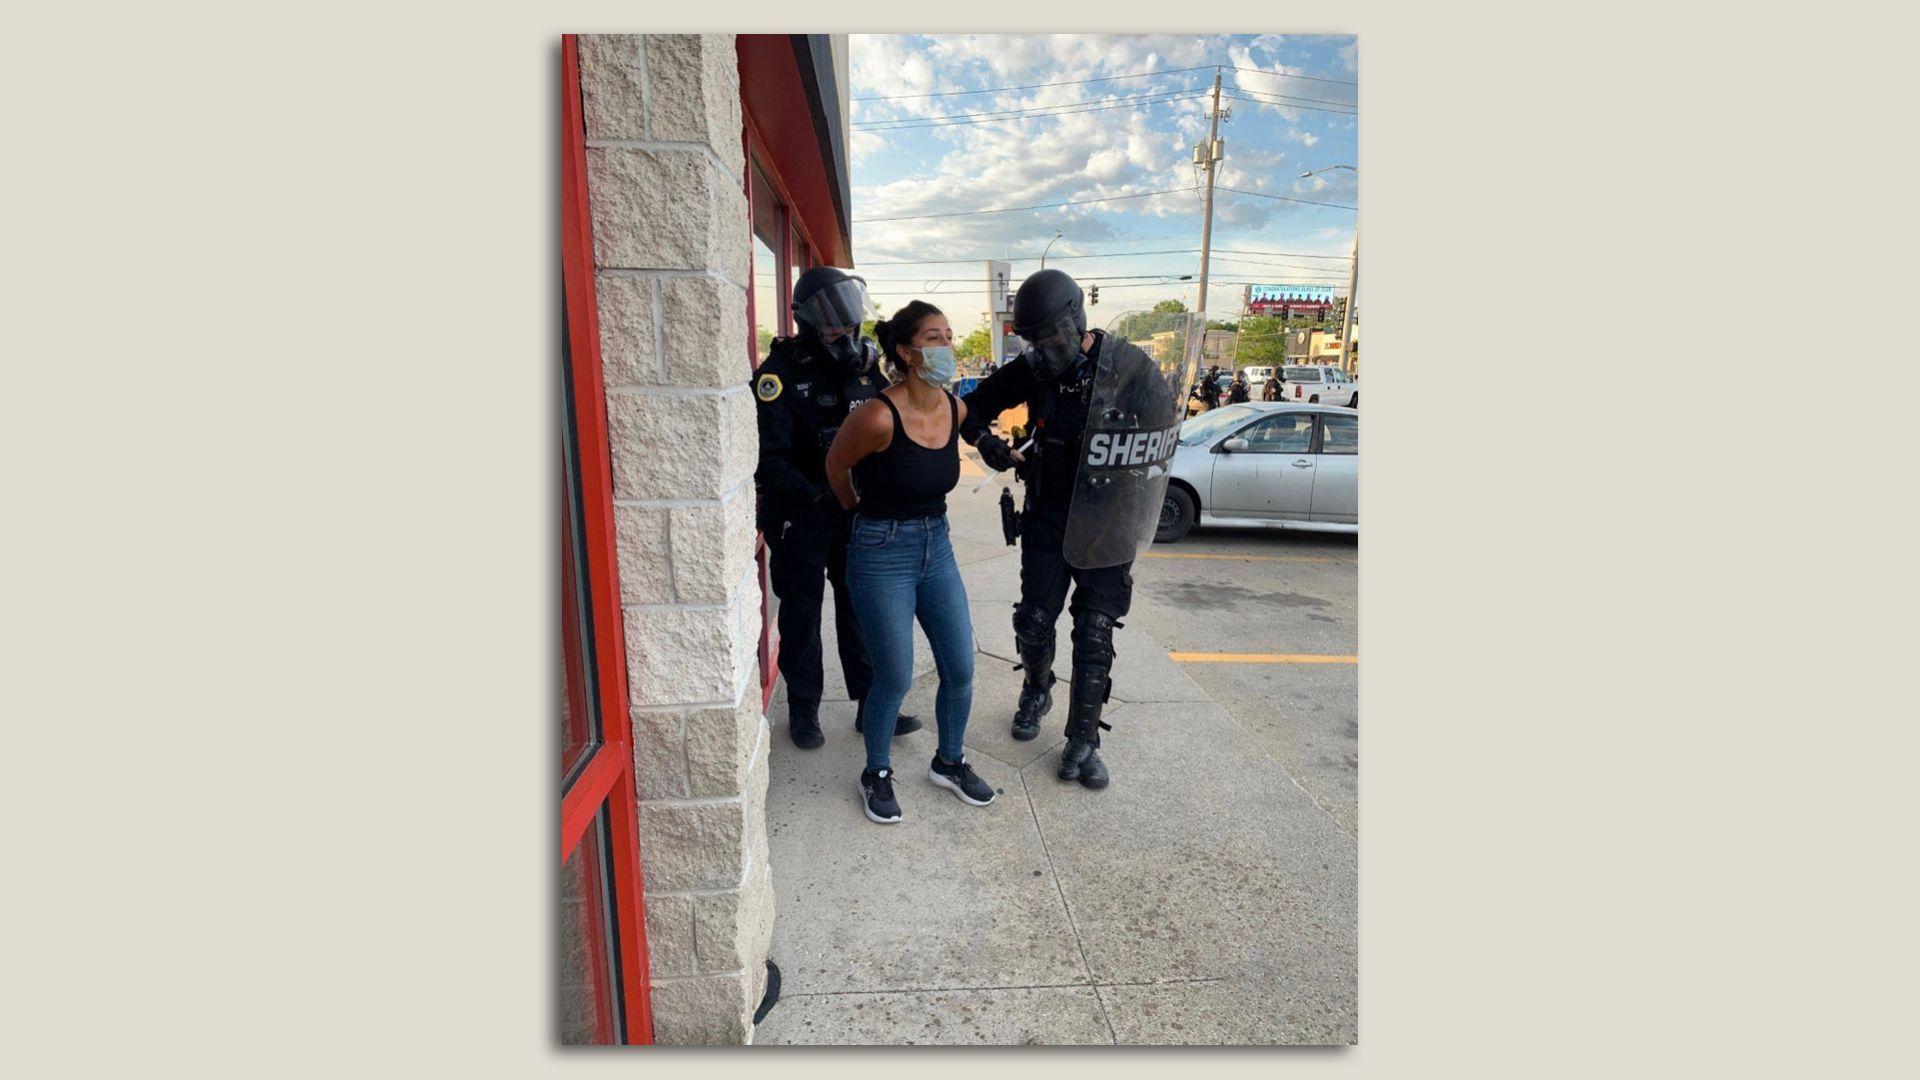 Des Moines police arrest reporter Andrea Sahouri outside Merle Hay Mall. Photo courtesy of Andrea Sahouri